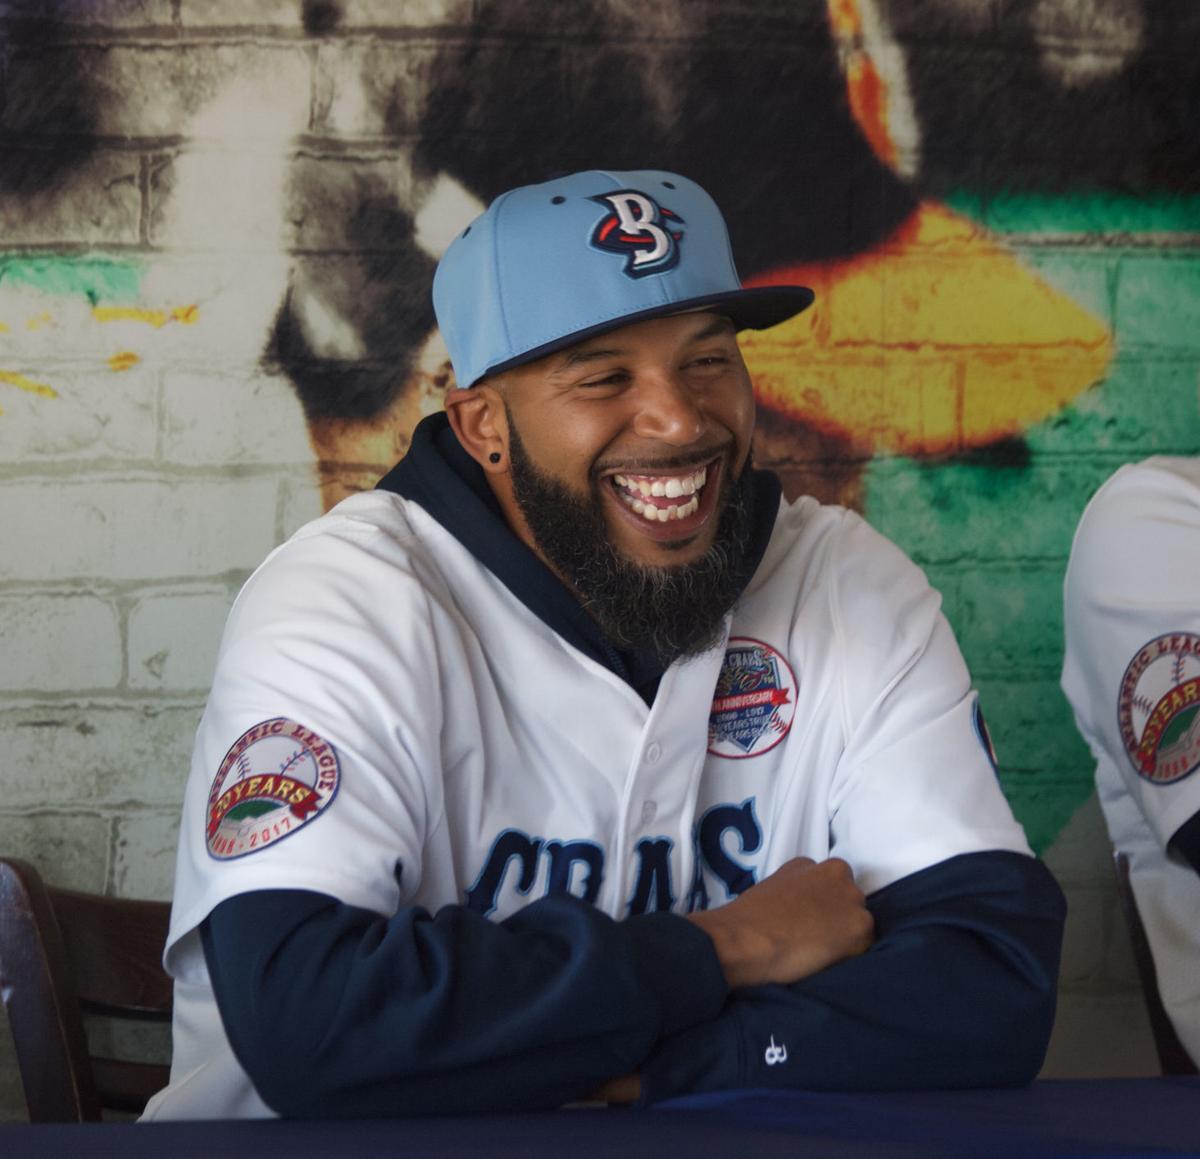 Blue Crabs warm up fans for 2018 baseball season